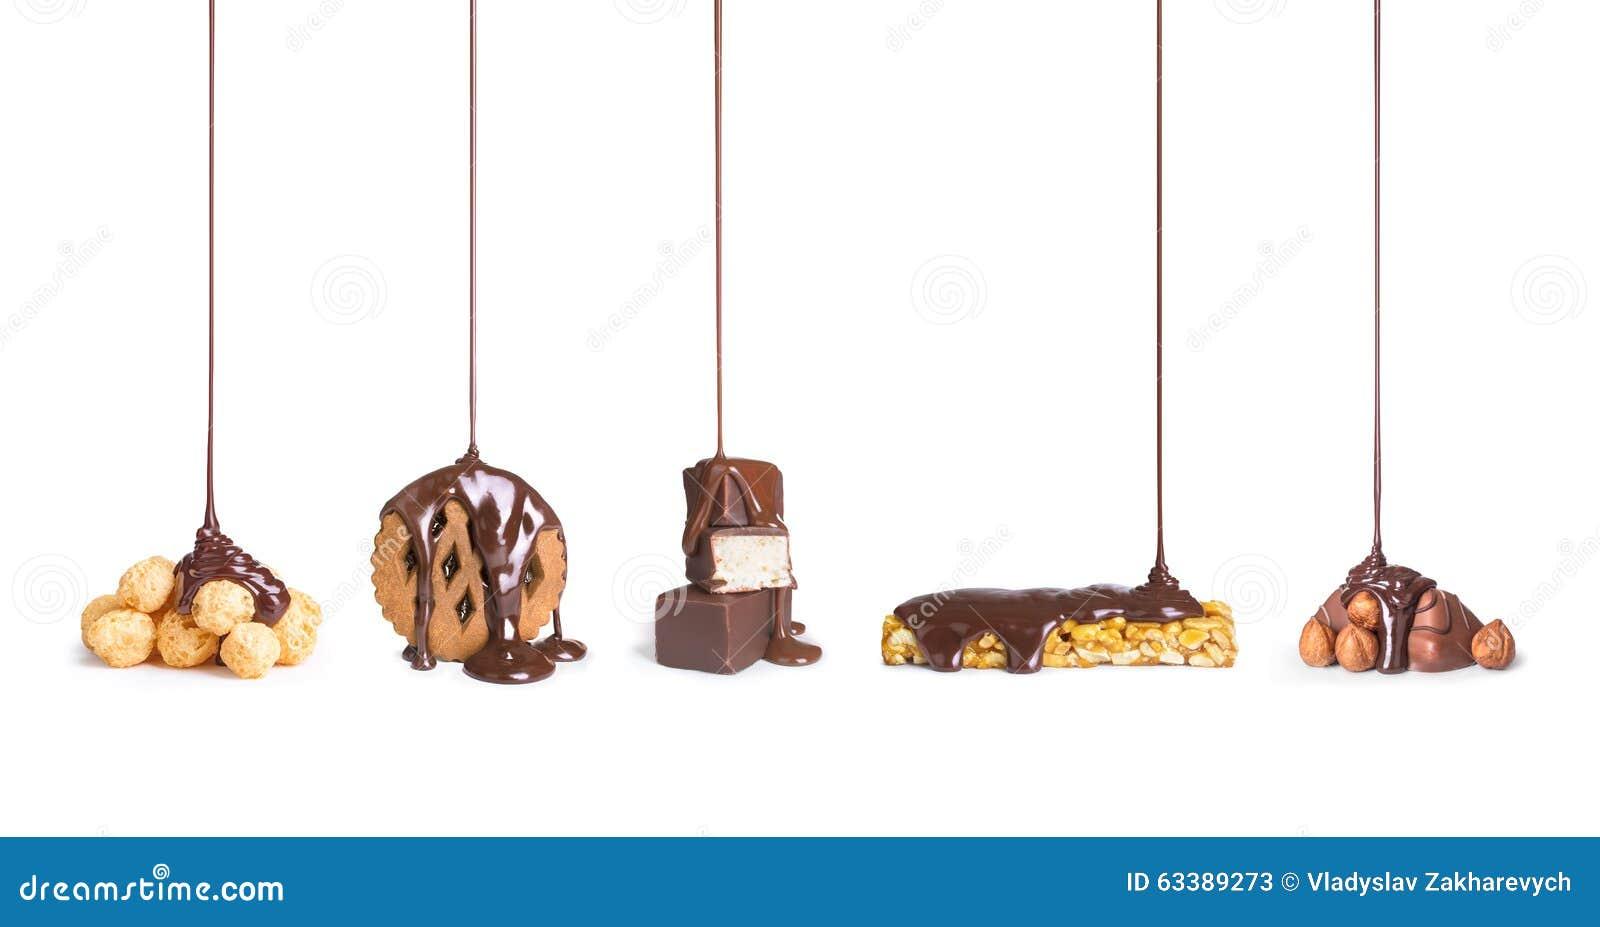 On cookies, chocolate,